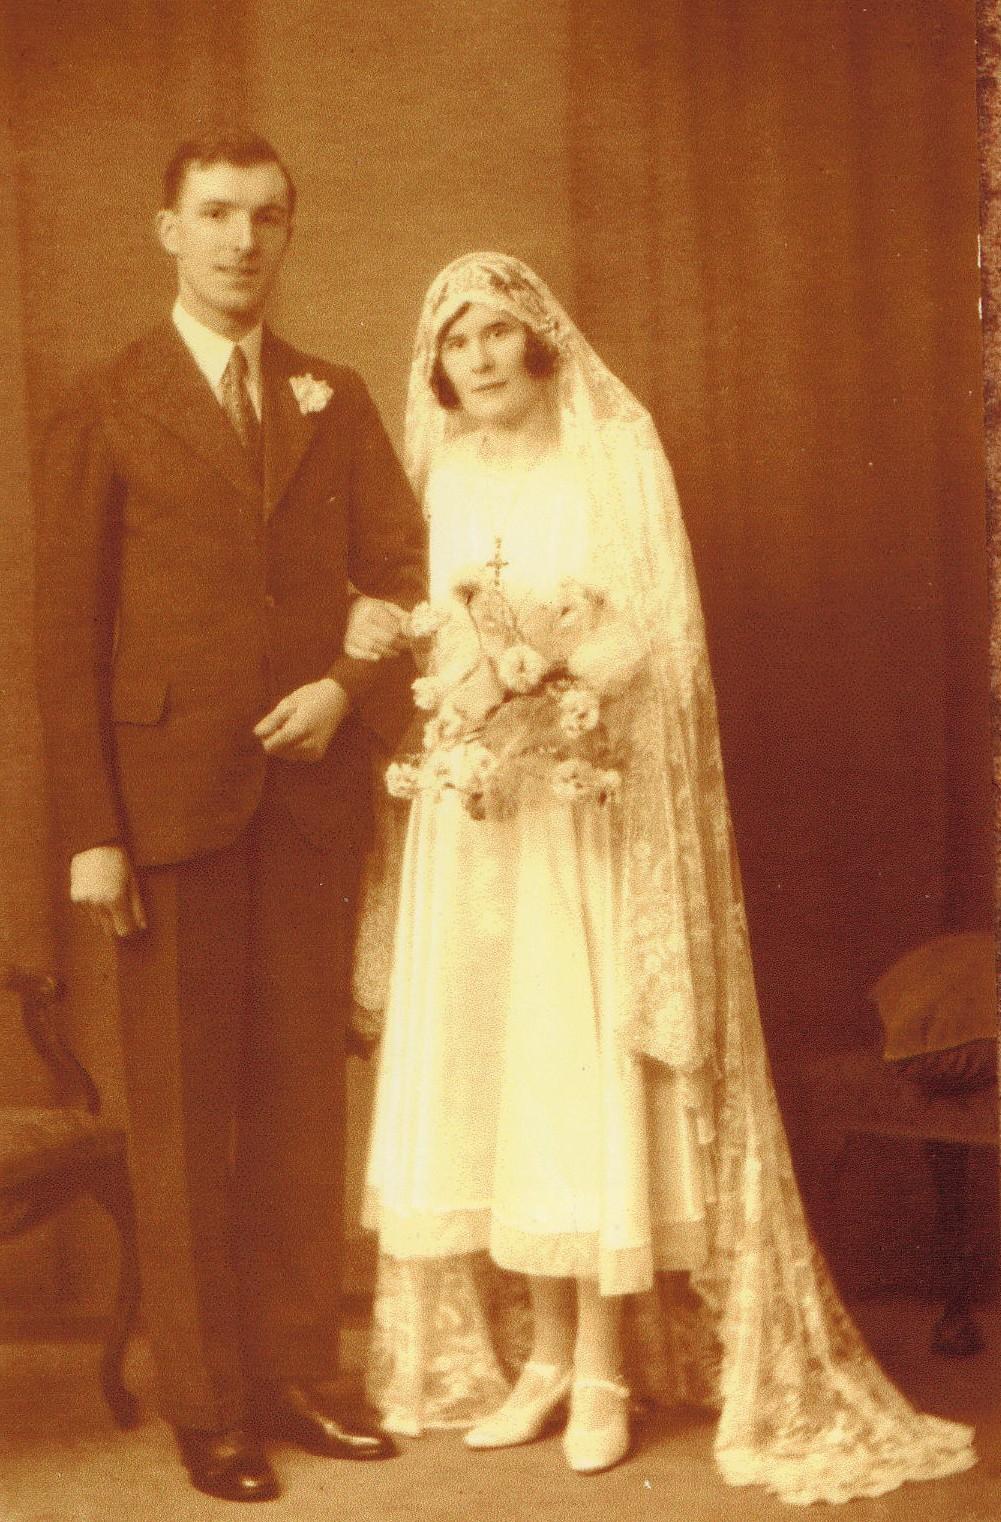 John Rowland Taylor & Dacia Kathleen Humphrey's Wedding